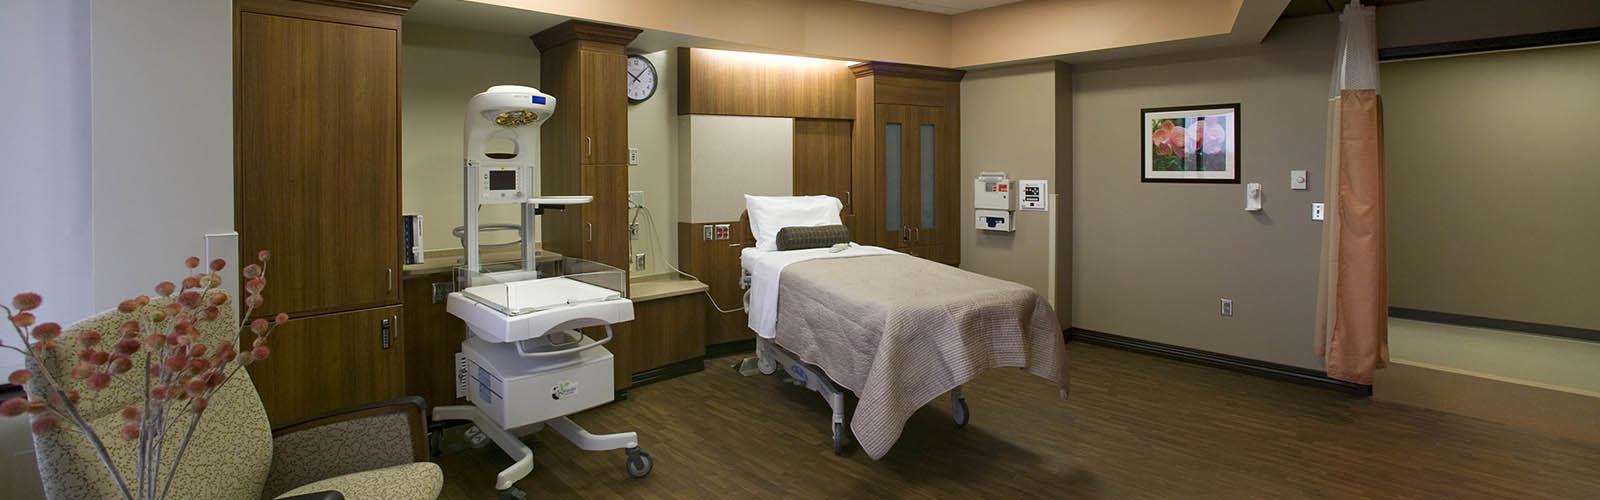 North Kansas City Hospital Maternity Unit Remodel 3